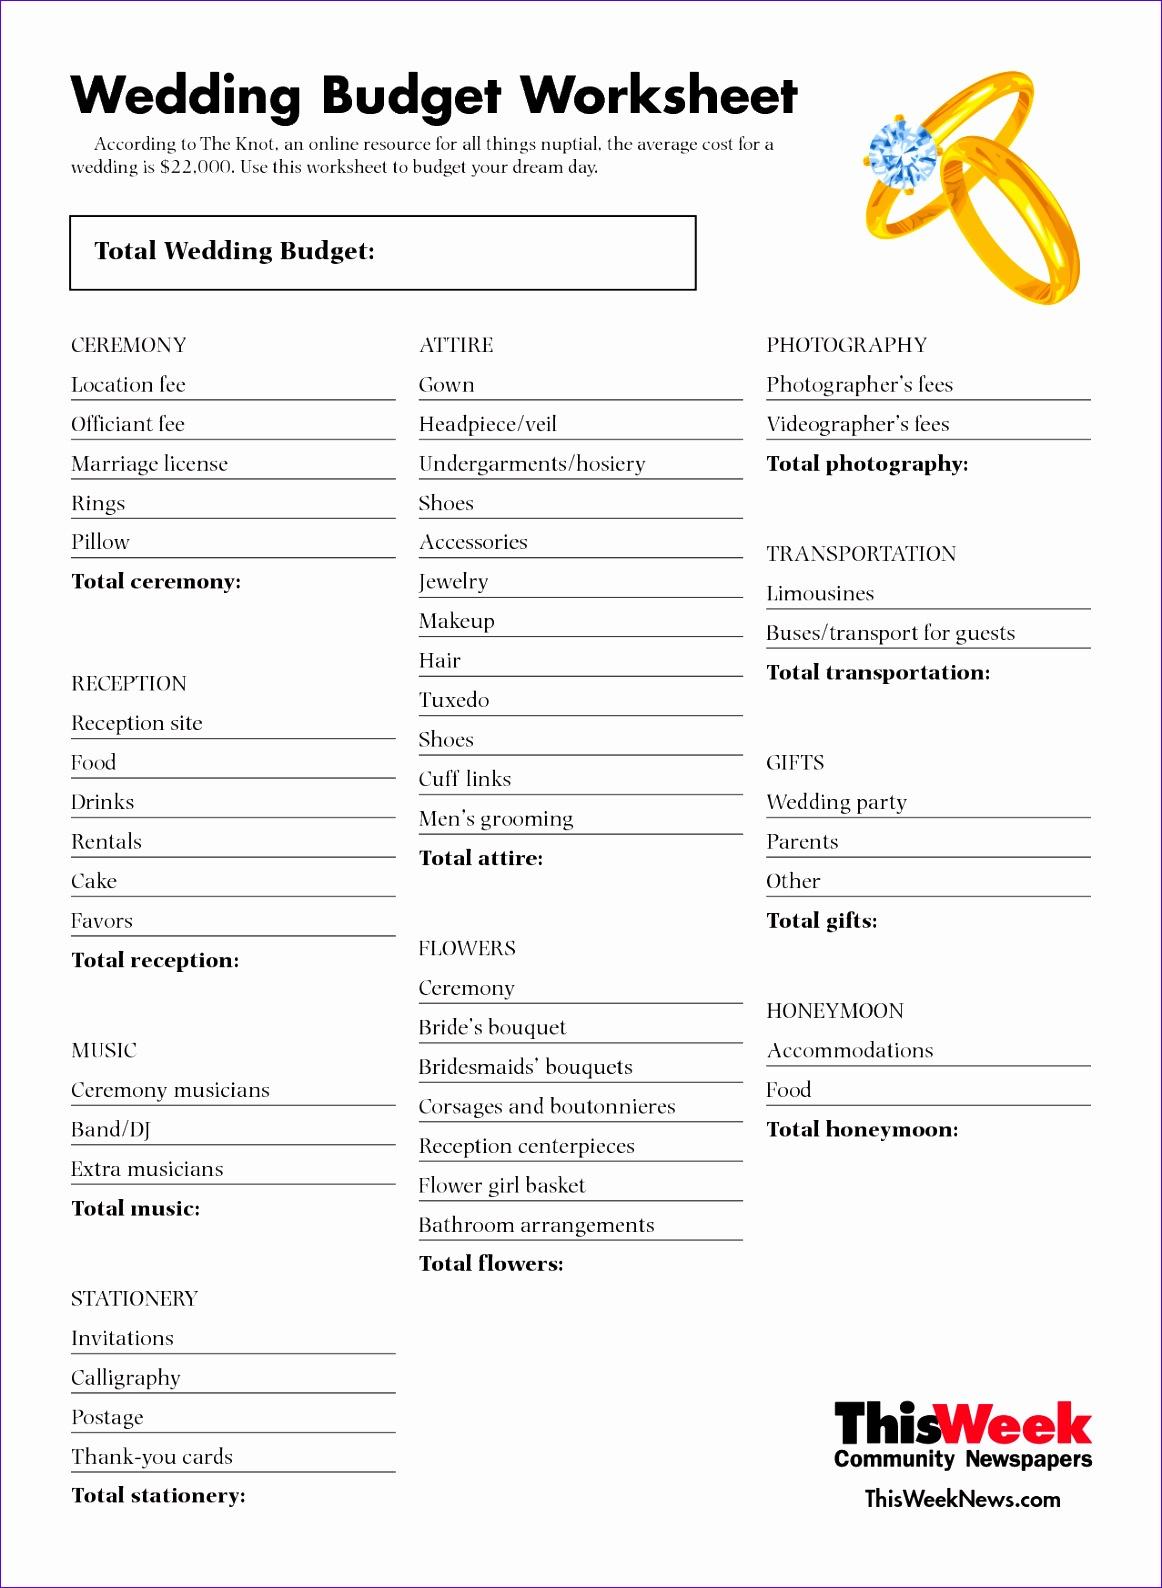 wedding bud worksheet